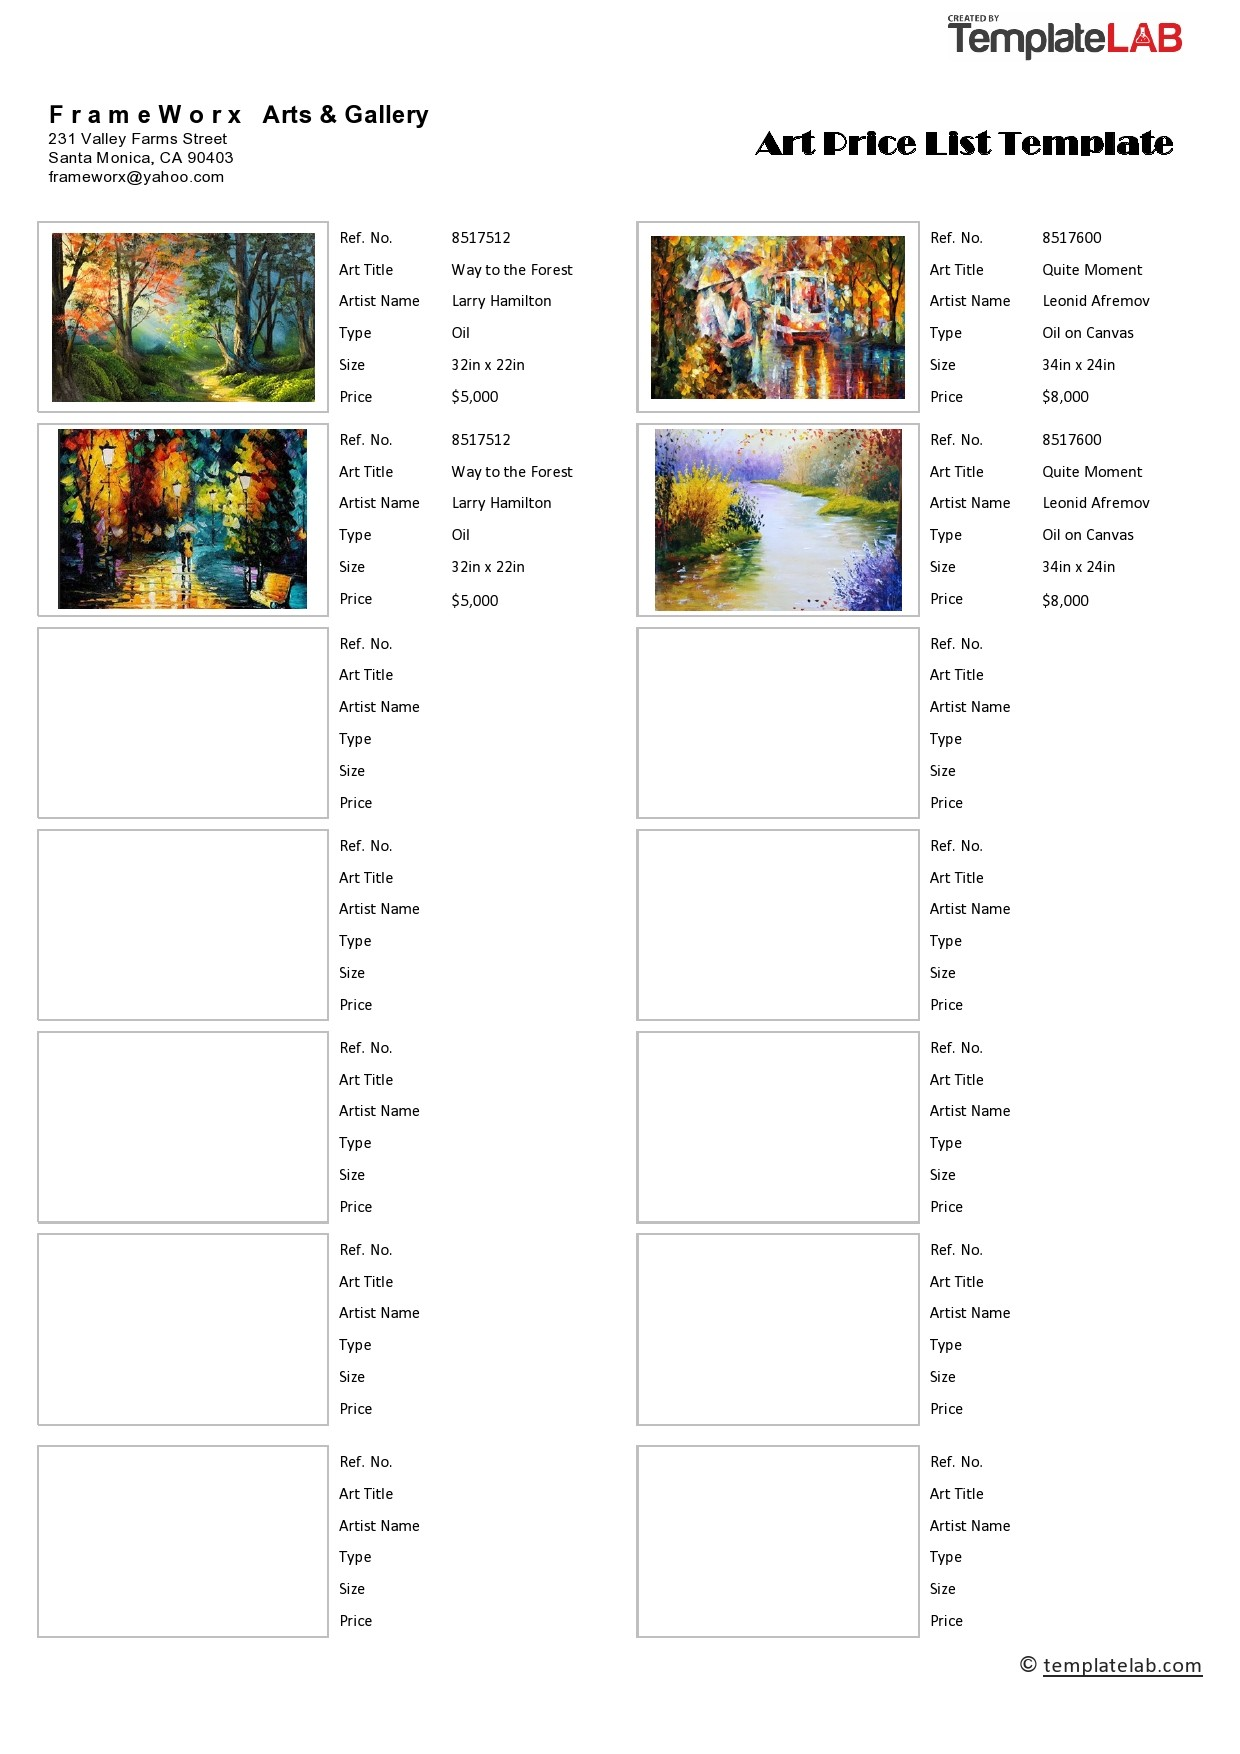 Free Art Price List Template